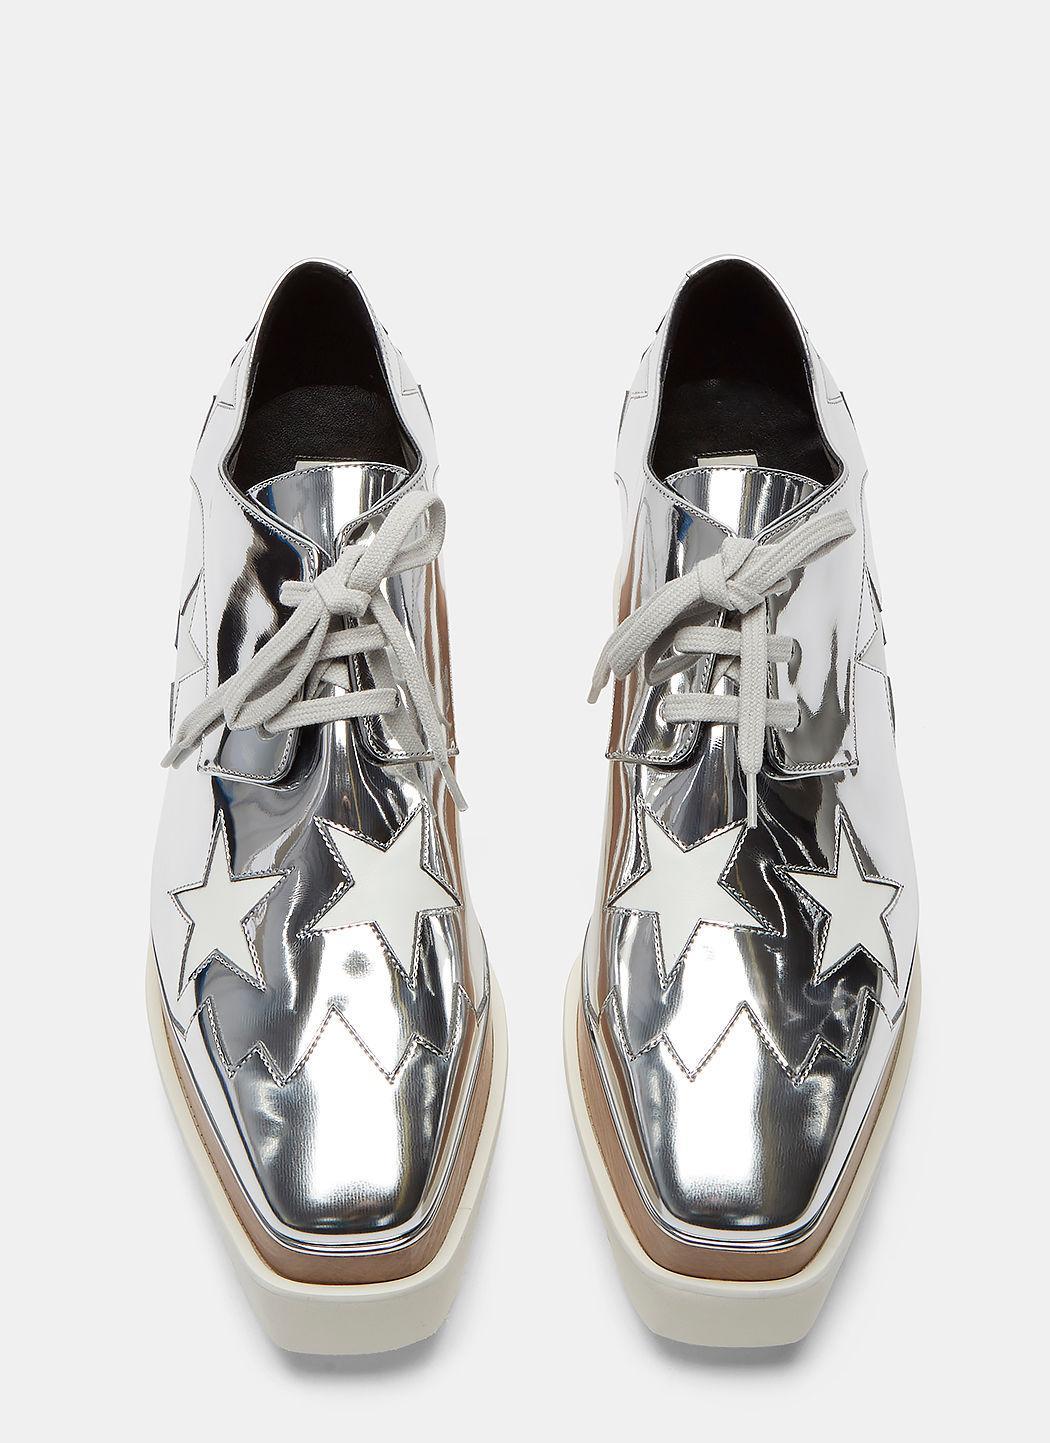 Stella McCartney Synthetic Women's Elyse Hackney Metallic Star Platform Shoes In Silver